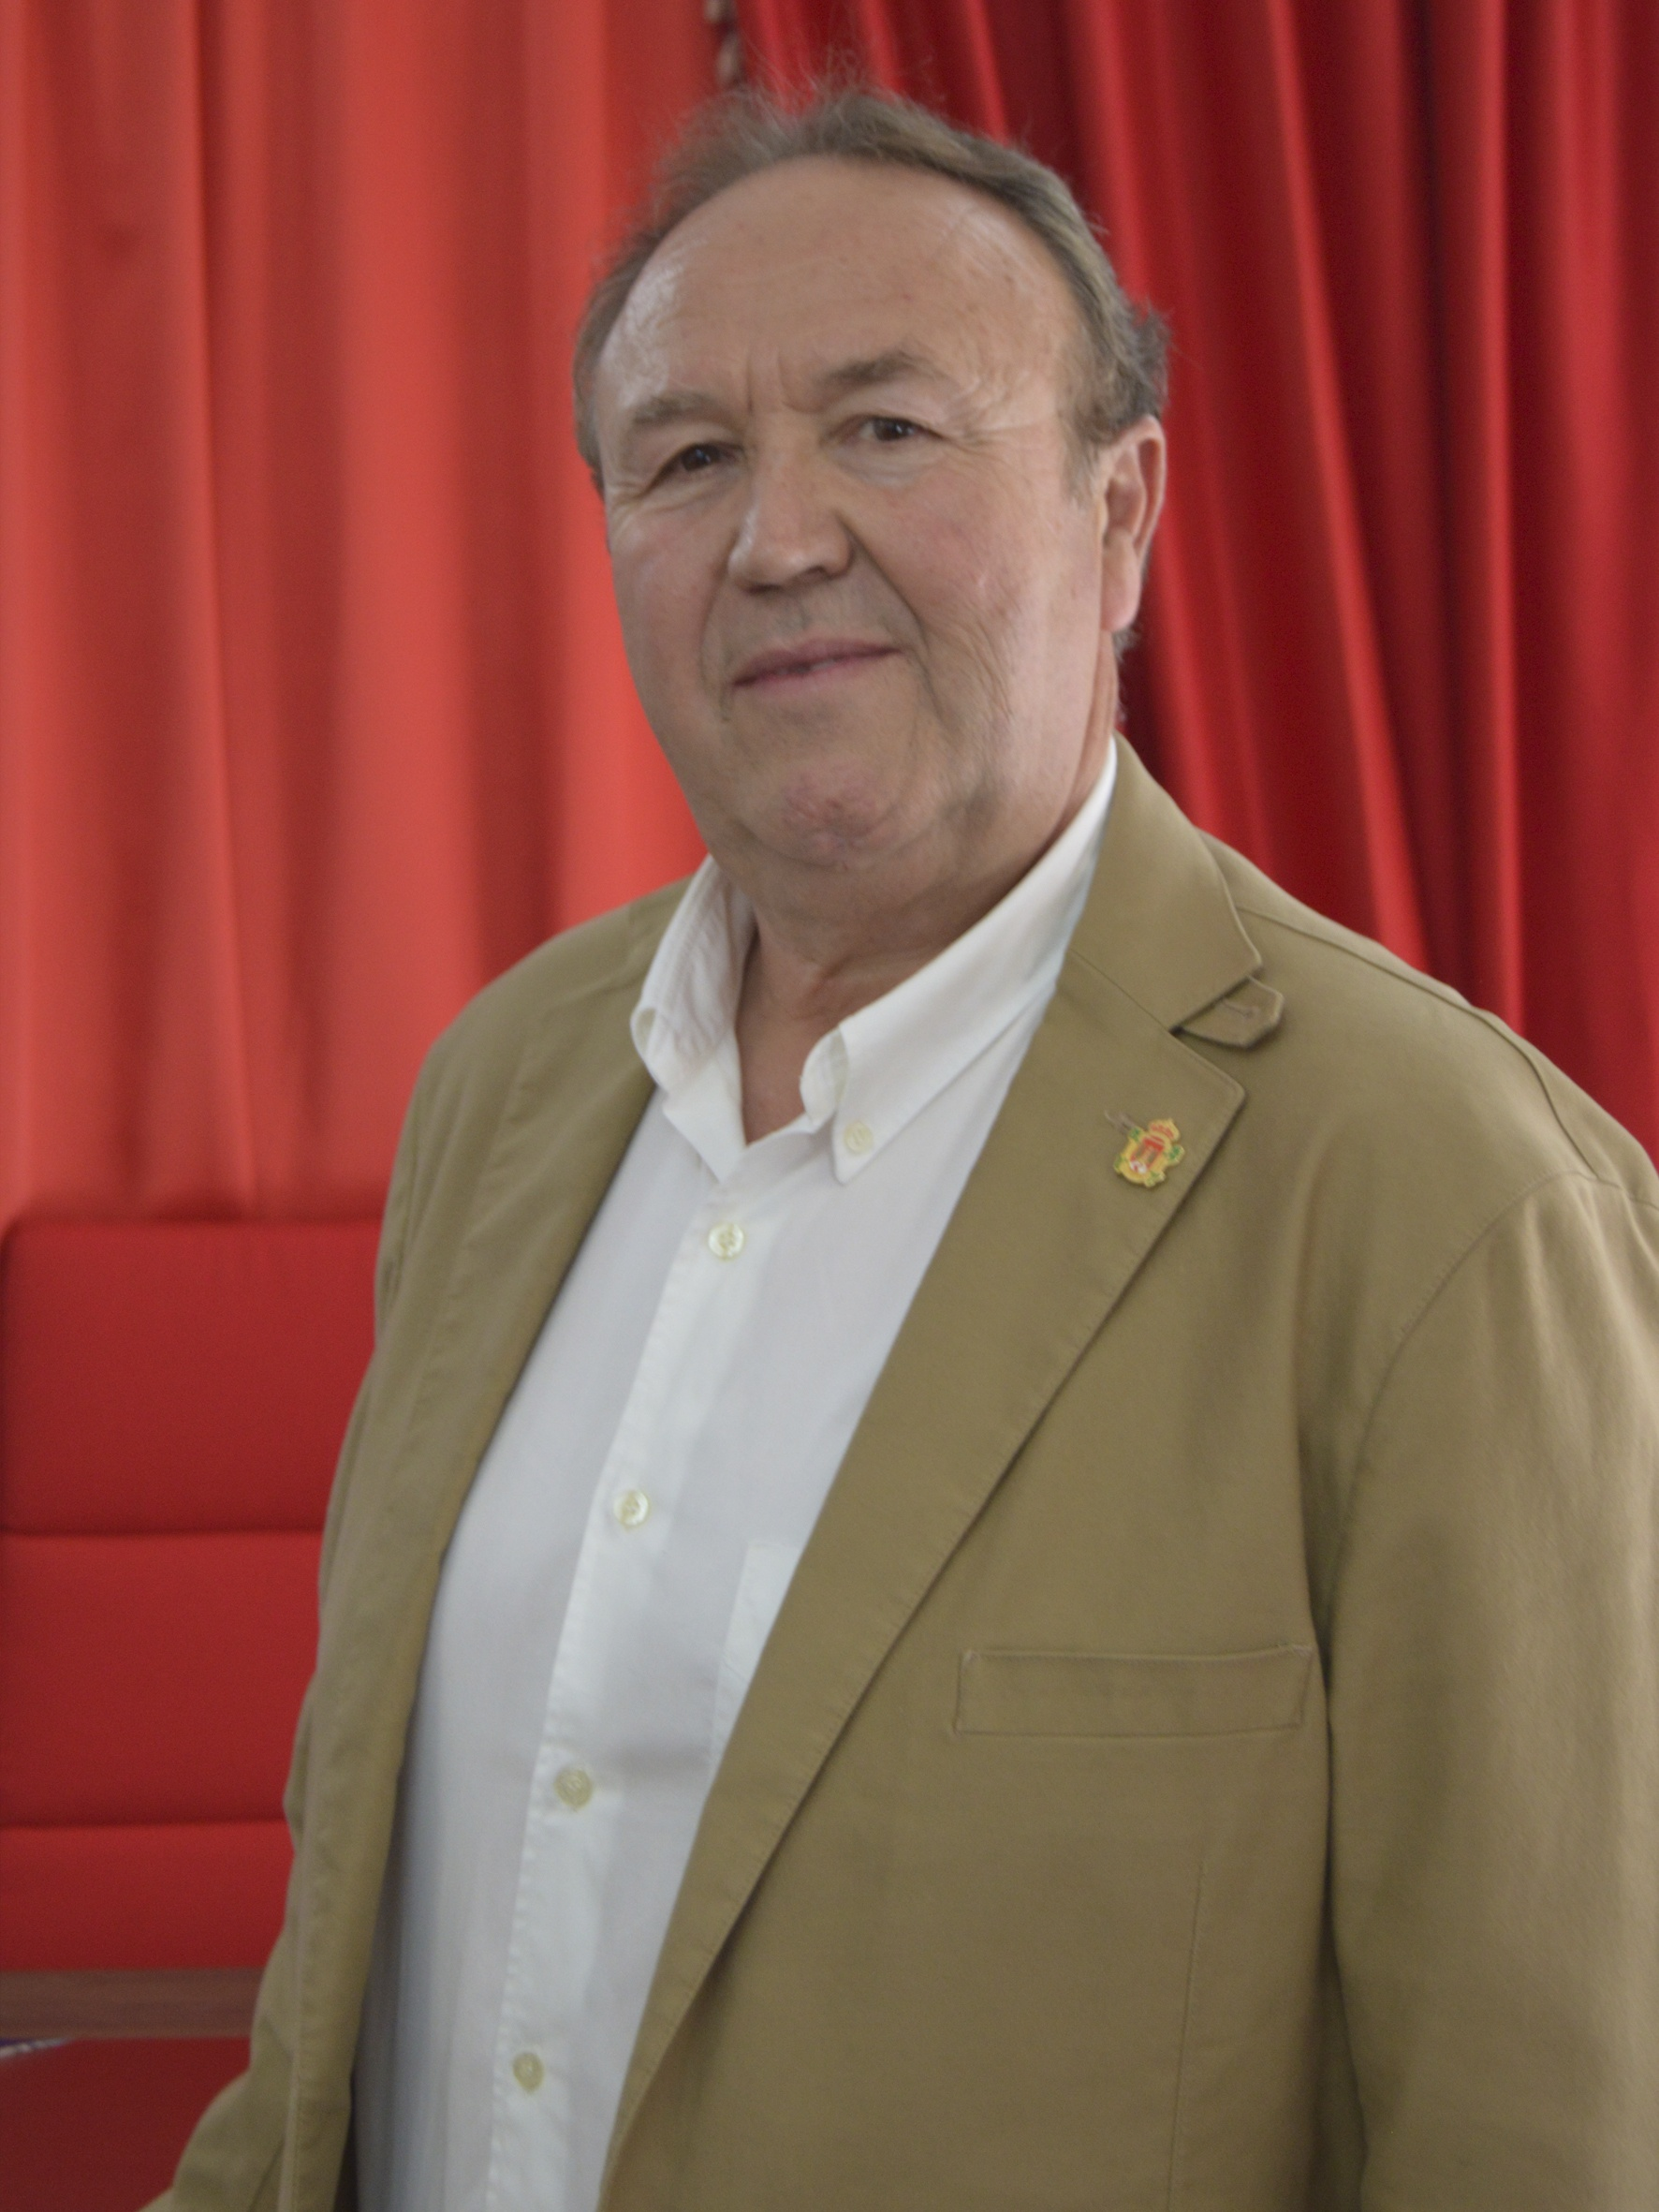 Manuel Quintana Luque